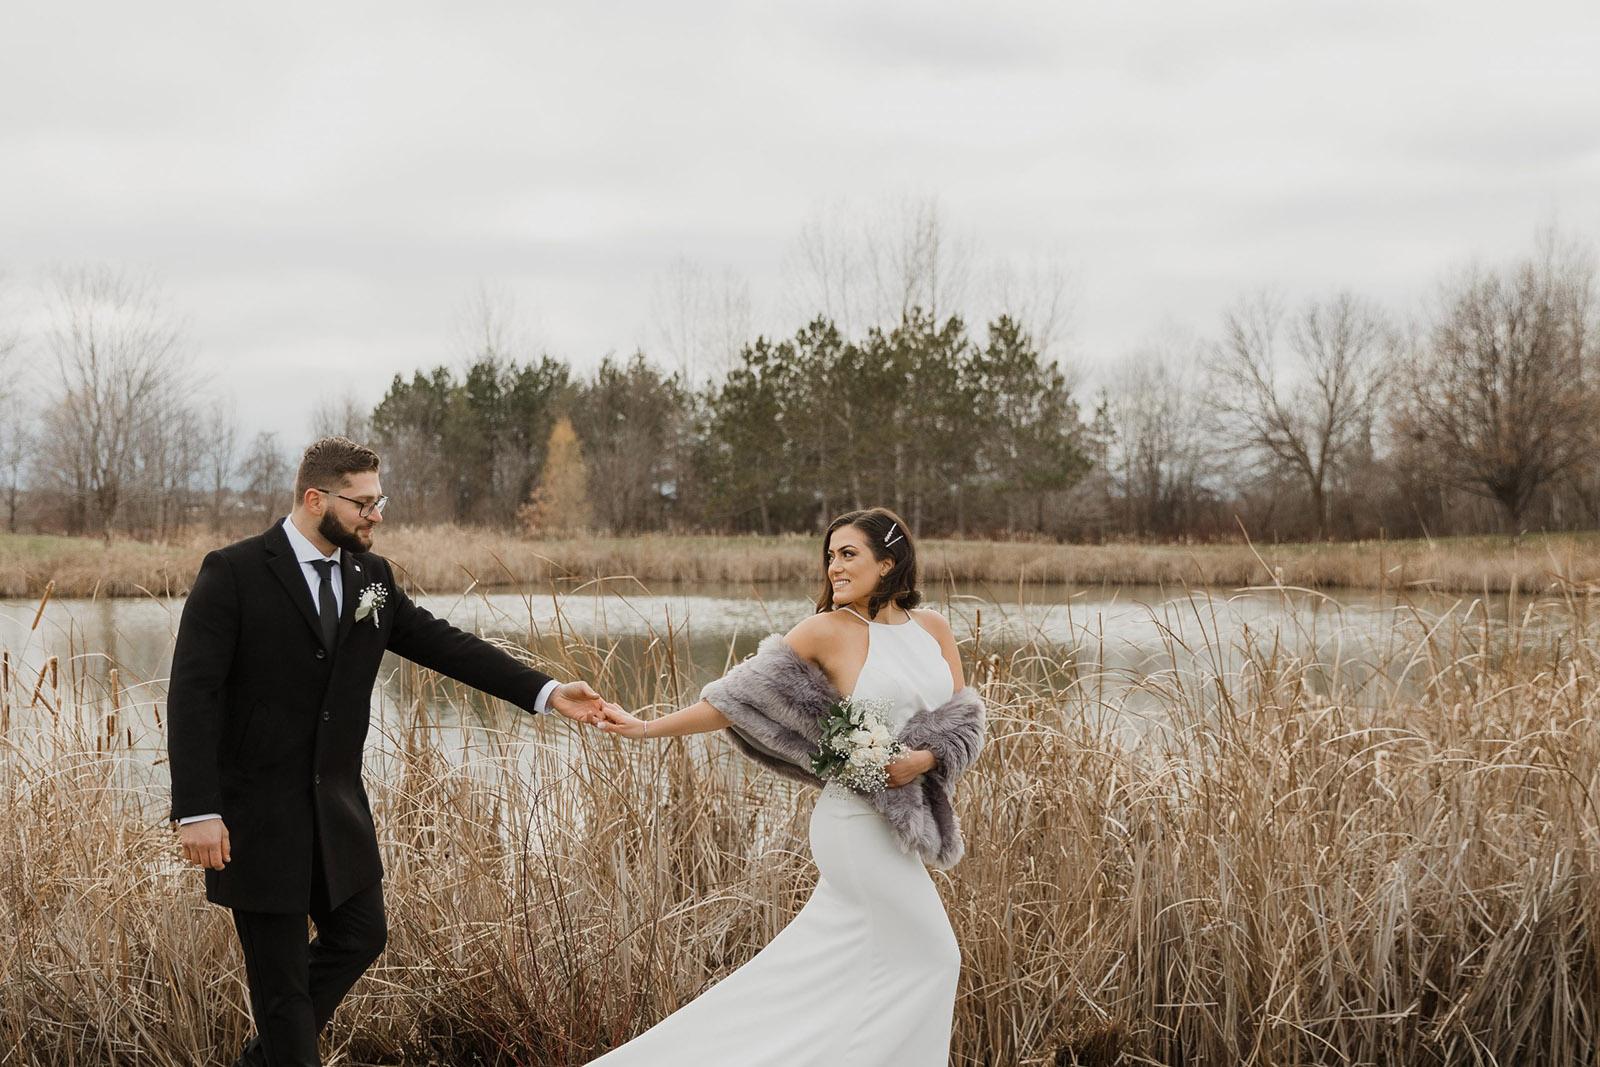 Sonia-V-Photography-Candid-Documentary-Style-Wedding-Photographer-Ottawa-Ontario-Candid-Romantic-Earthy-Wedding-Couple-Fur-Stole-Boho-Ontario